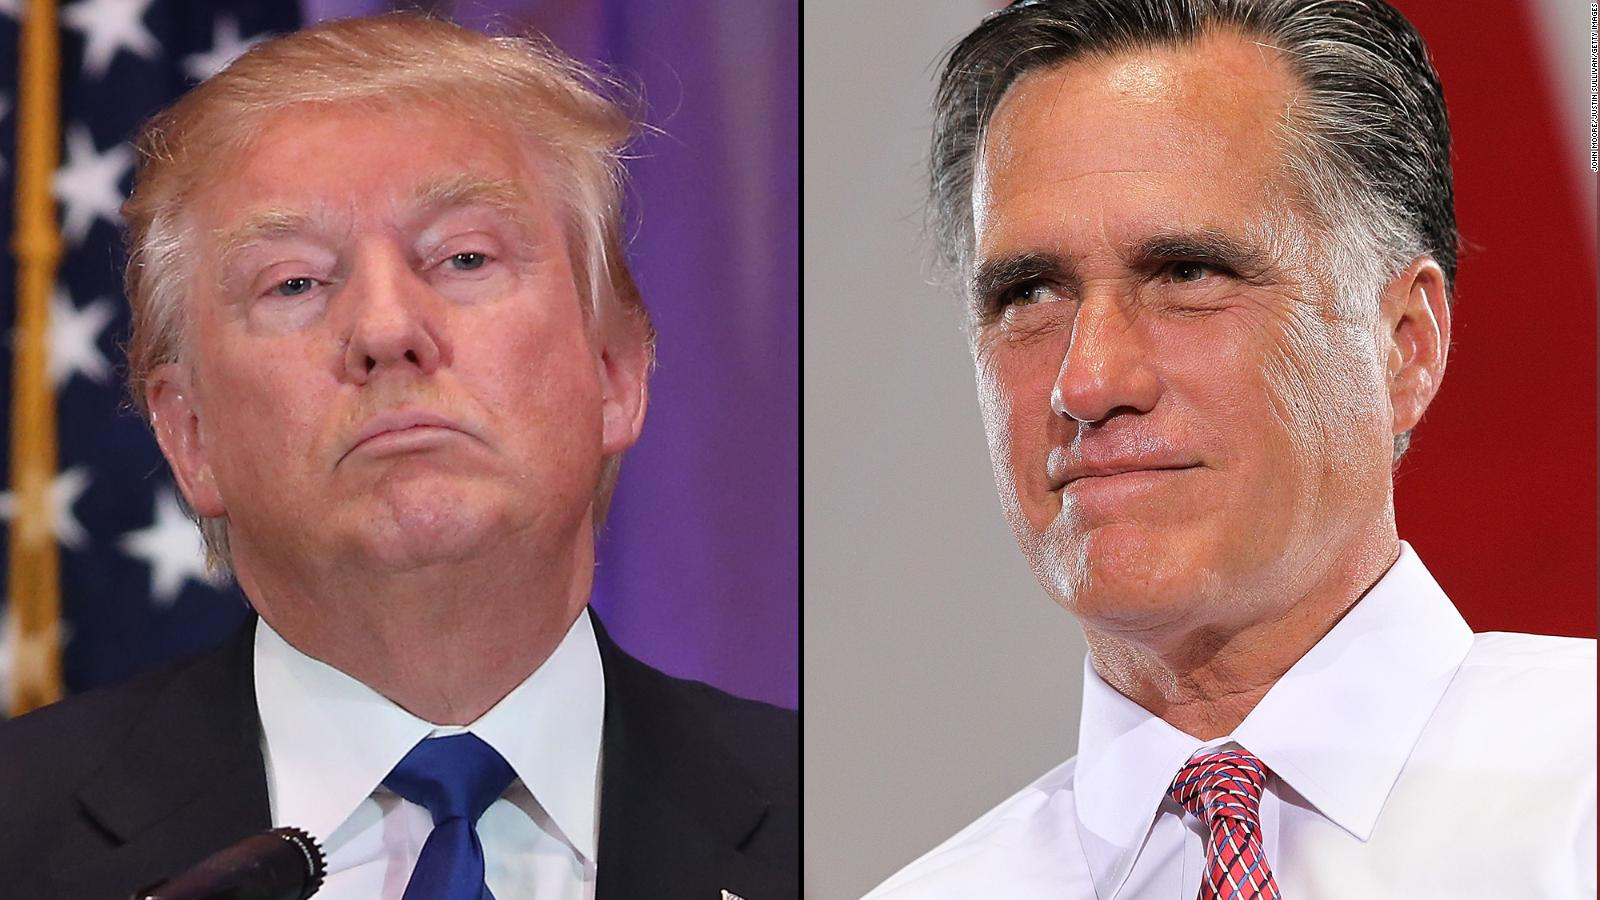 Donald Trump-Mitt Romney meeting another wild 2016 twist - CNNPolitics